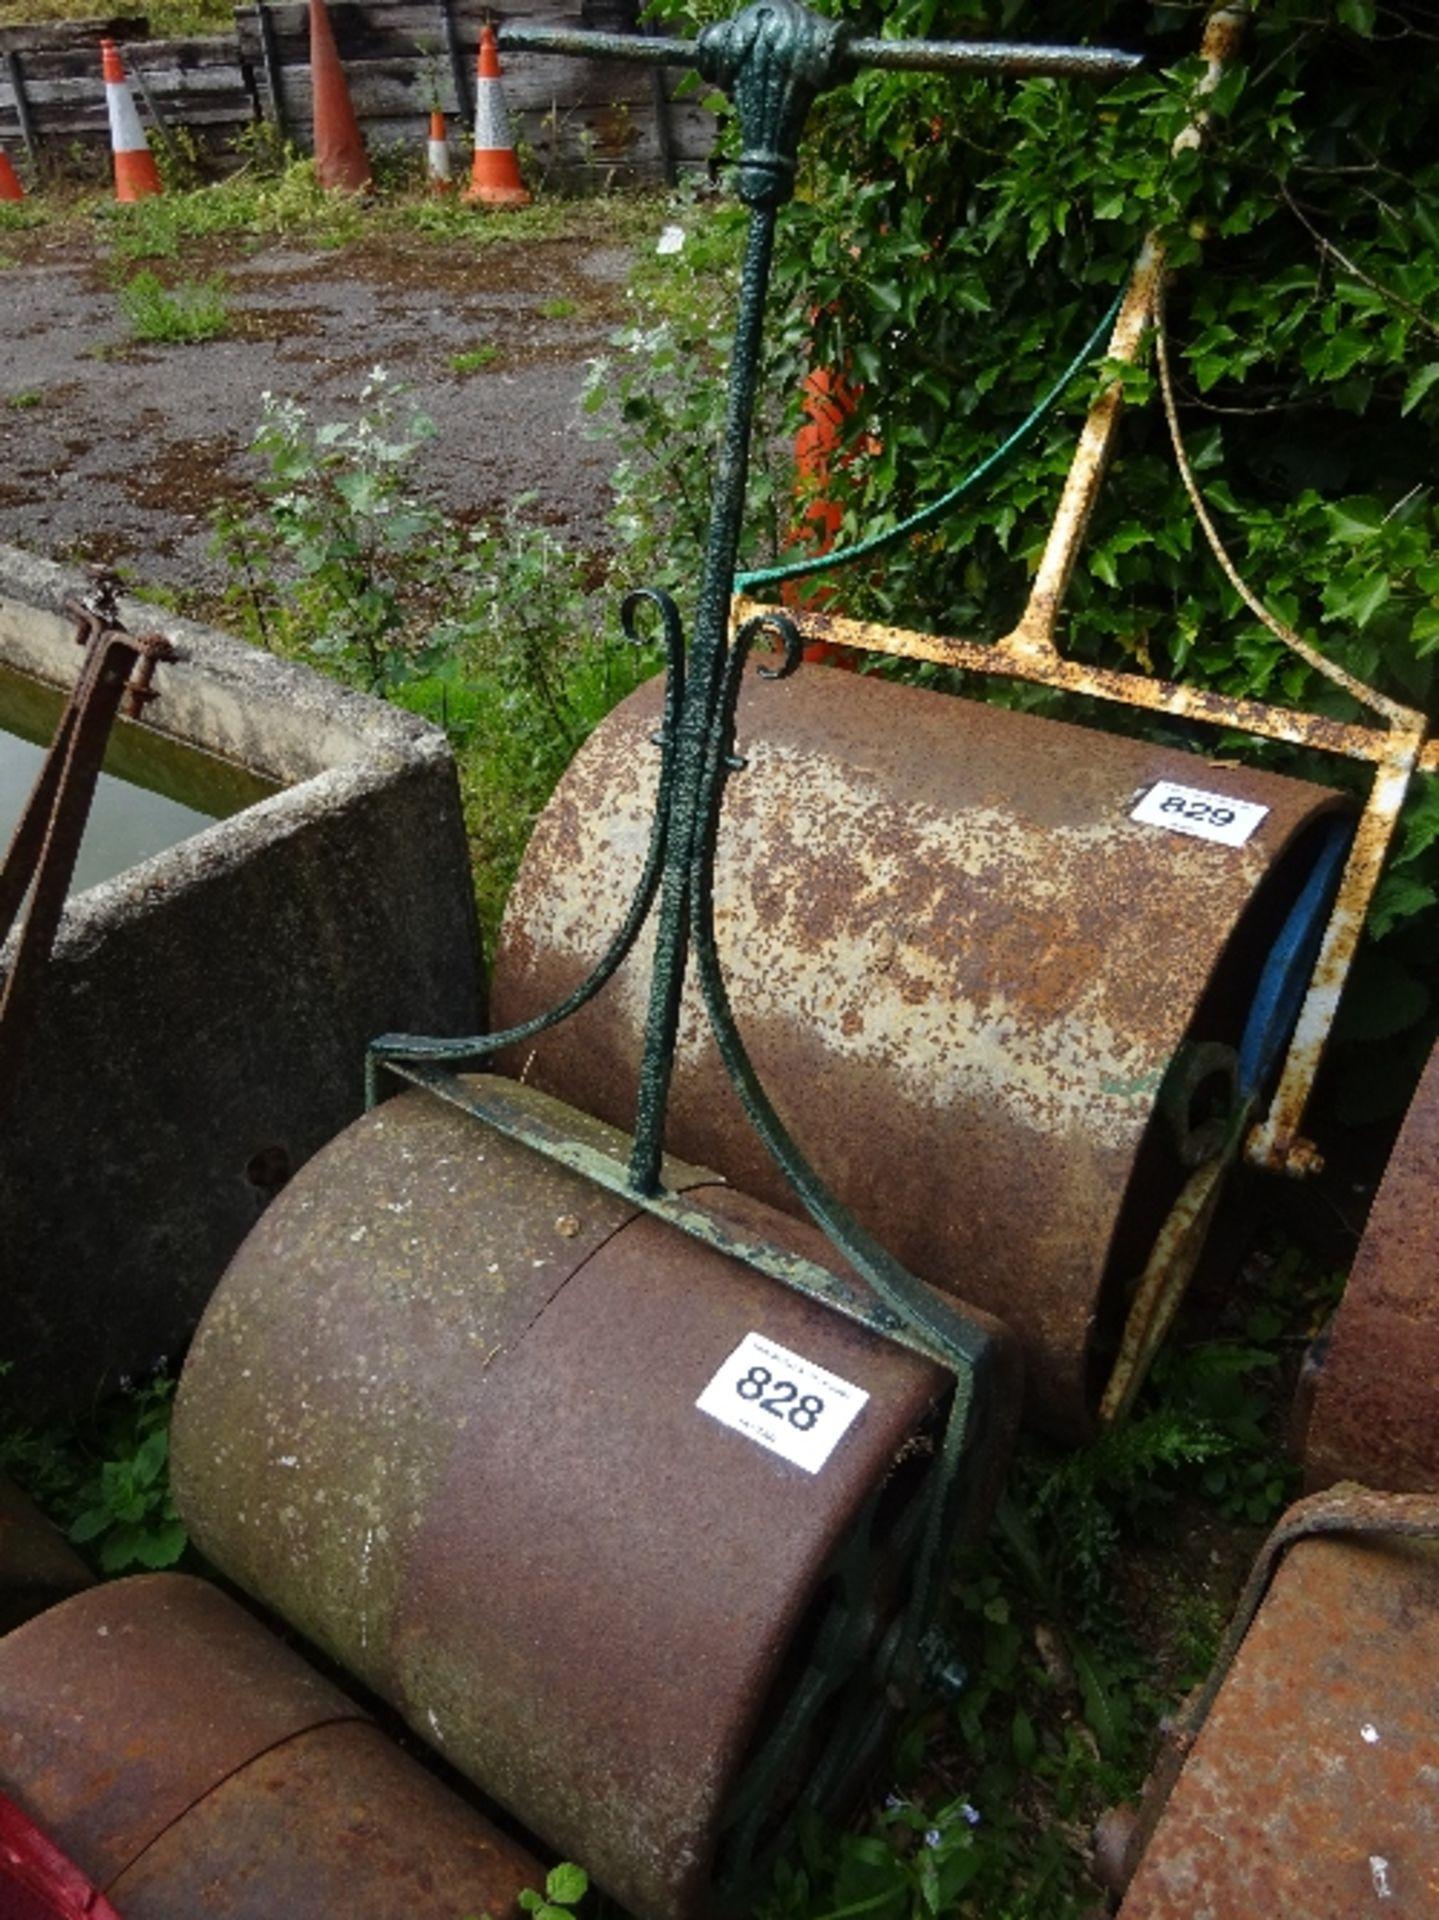 Lot 828 - Cast iron roller